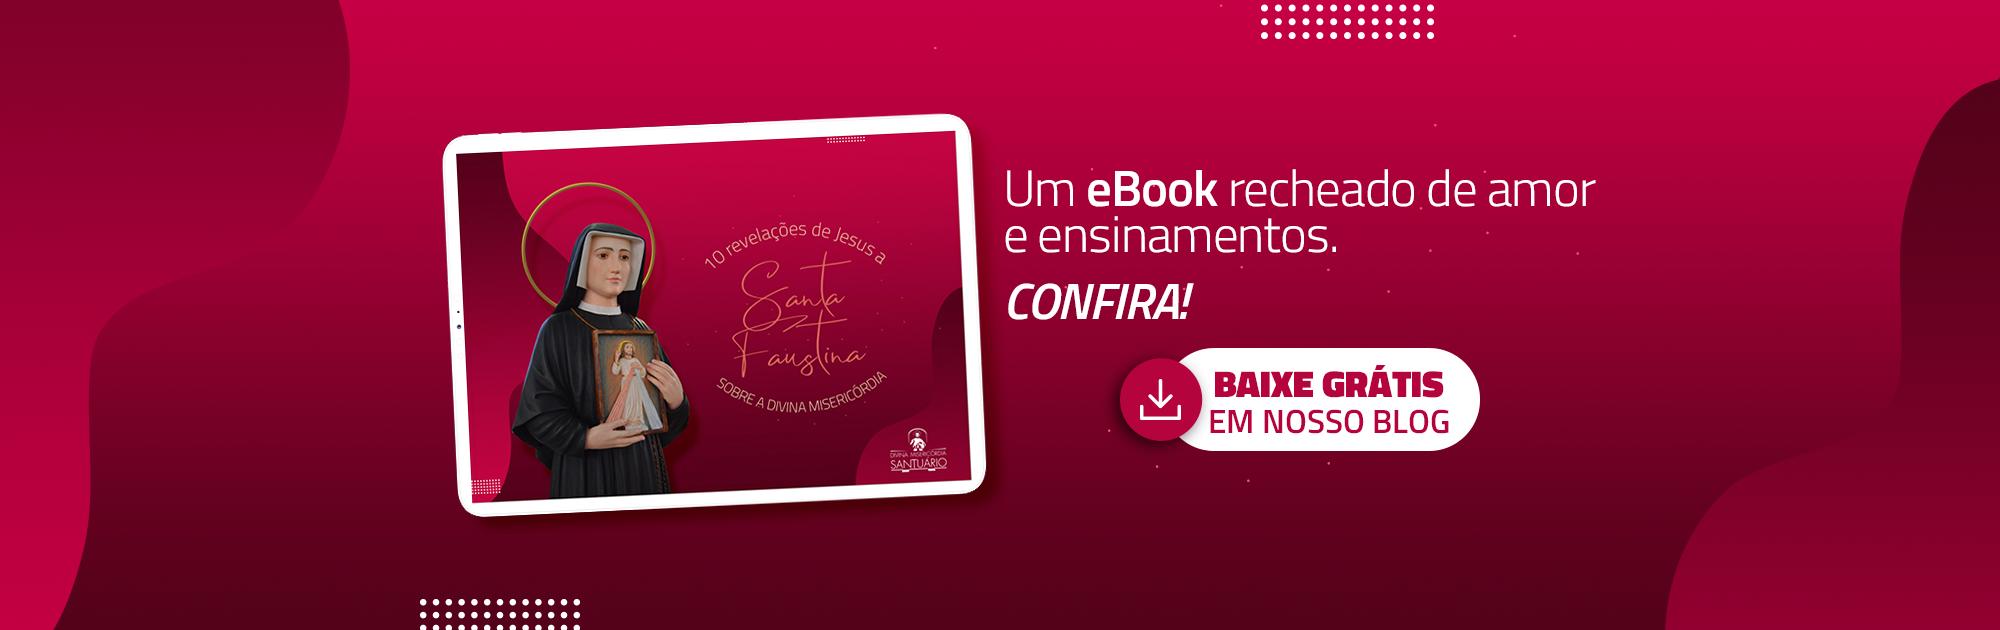 Banner-Blog-Ebook-10-coisas-que-Jesus-revelou-a-Santa-Faustina-sobre-a-Divina-Misericórdia-Santuário-da-Divina-Misericórdia